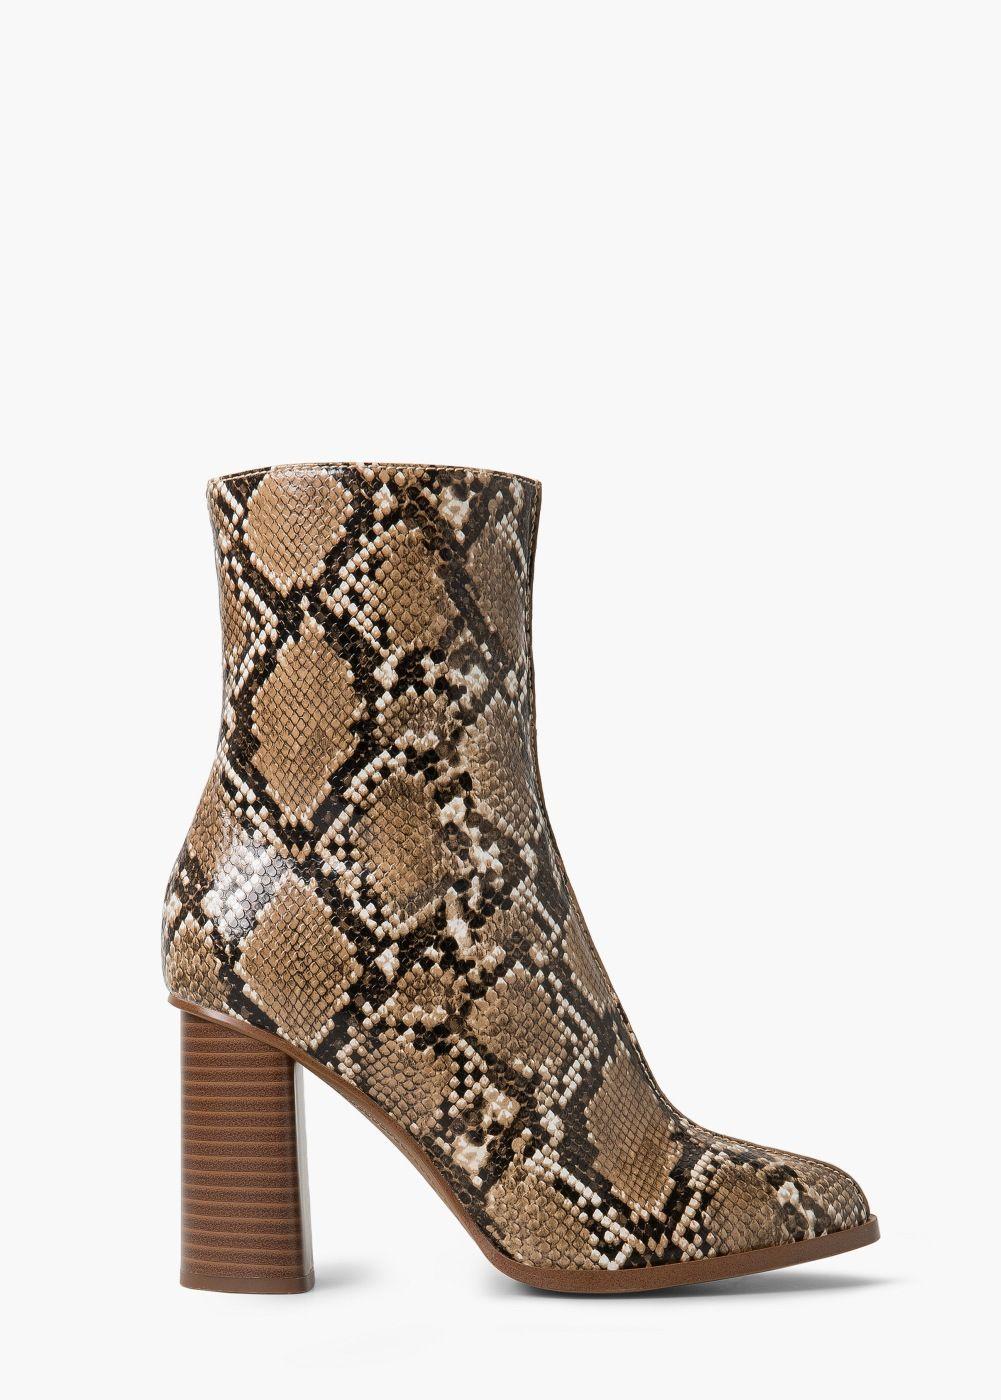 Snake Effect Ankle Boots Women Mango United Kingdom Snakeskin Boots High Heel Boots Ankle Boots